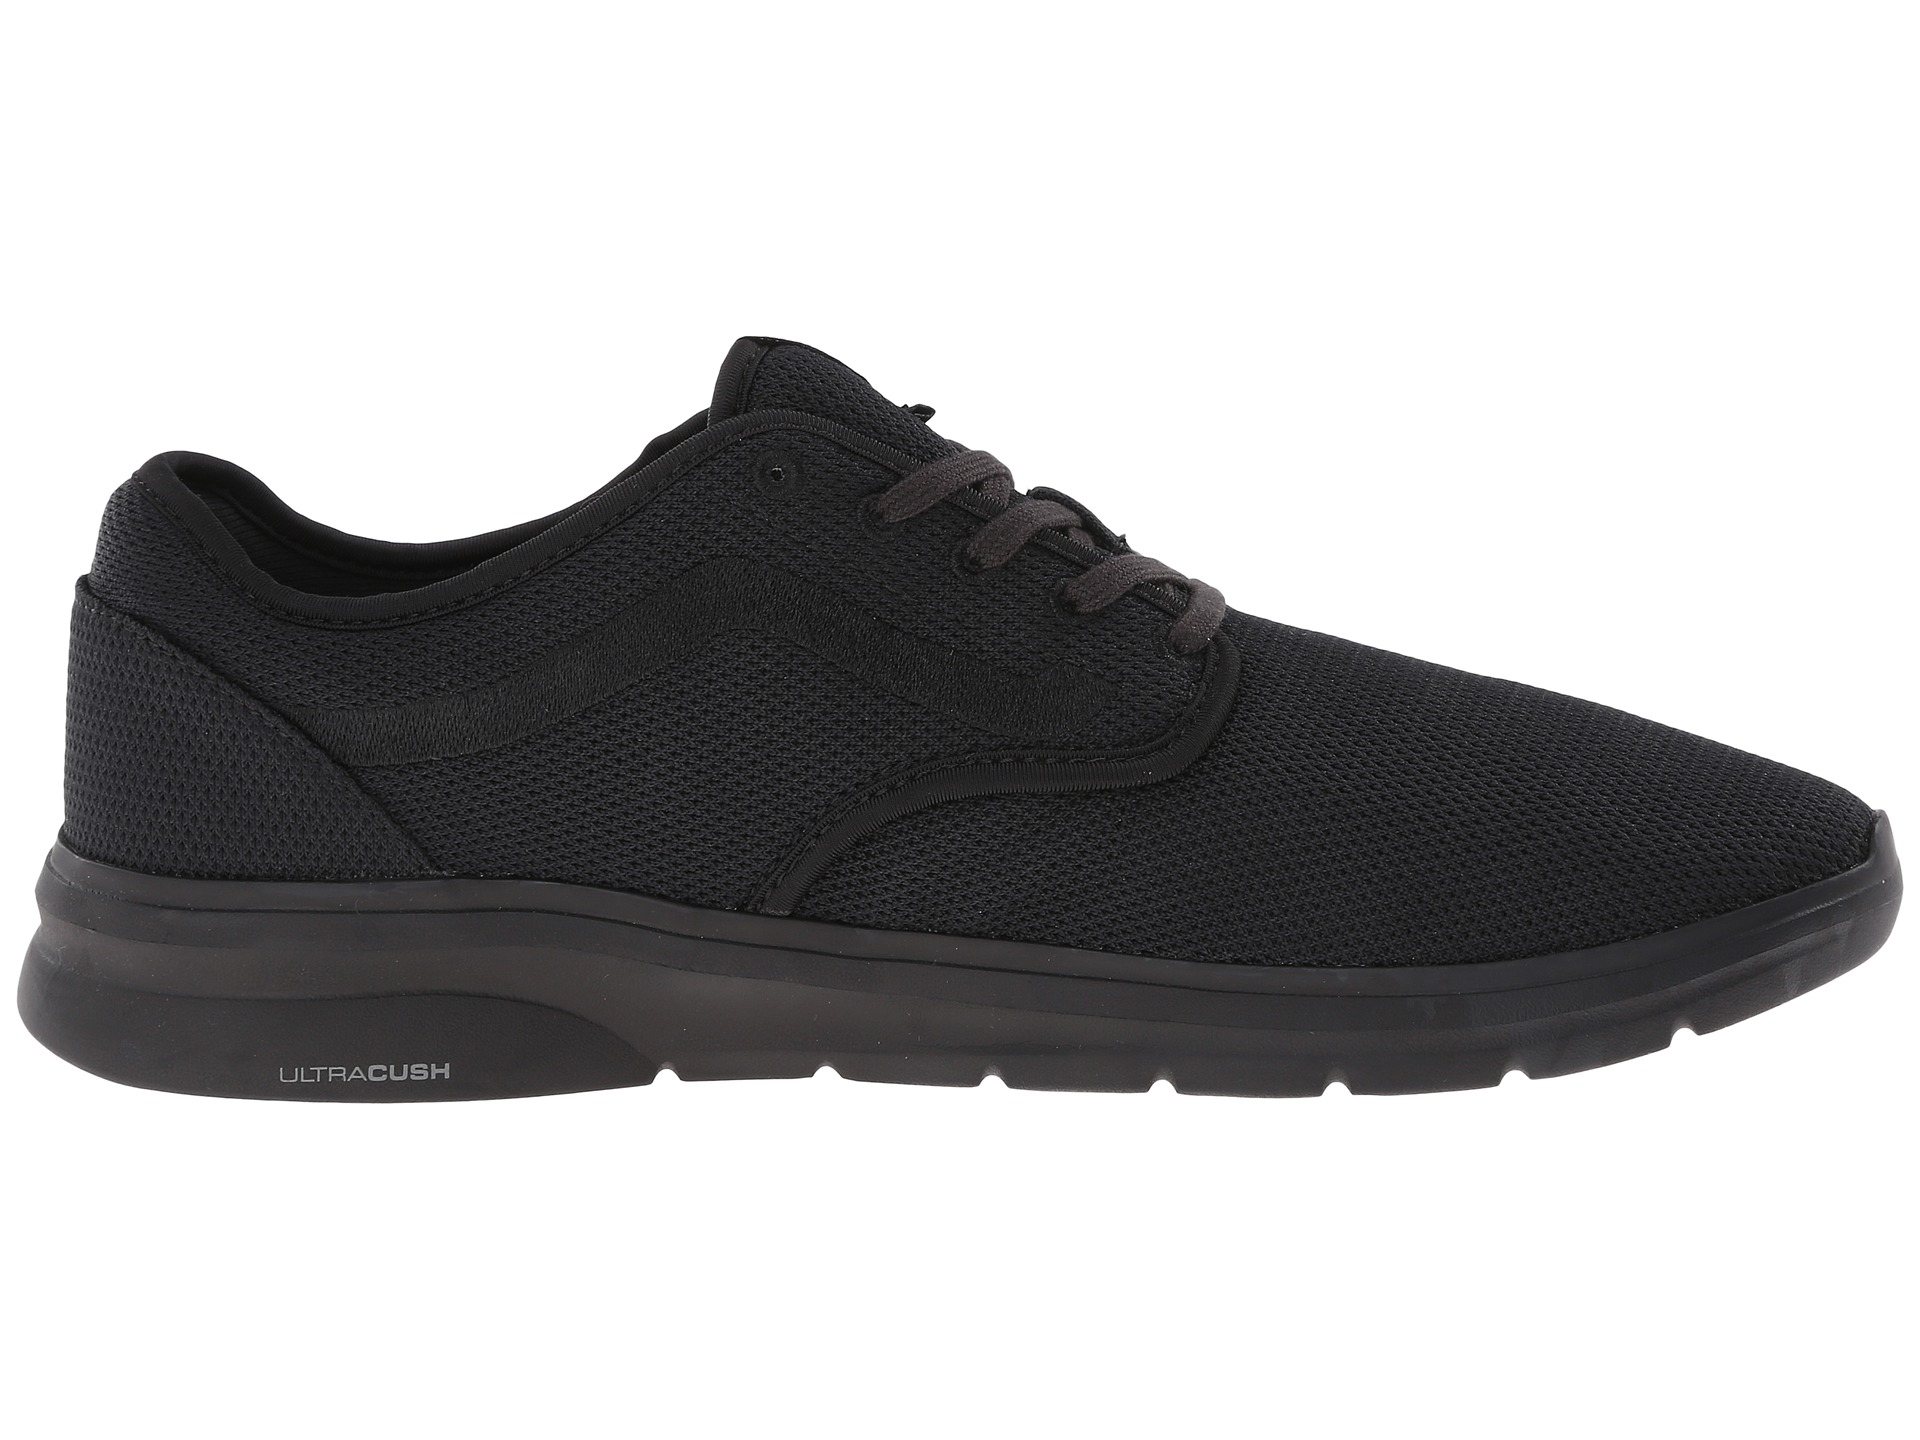 4804413a2a185b Lyst - Vans Iso 2 in Black for Men